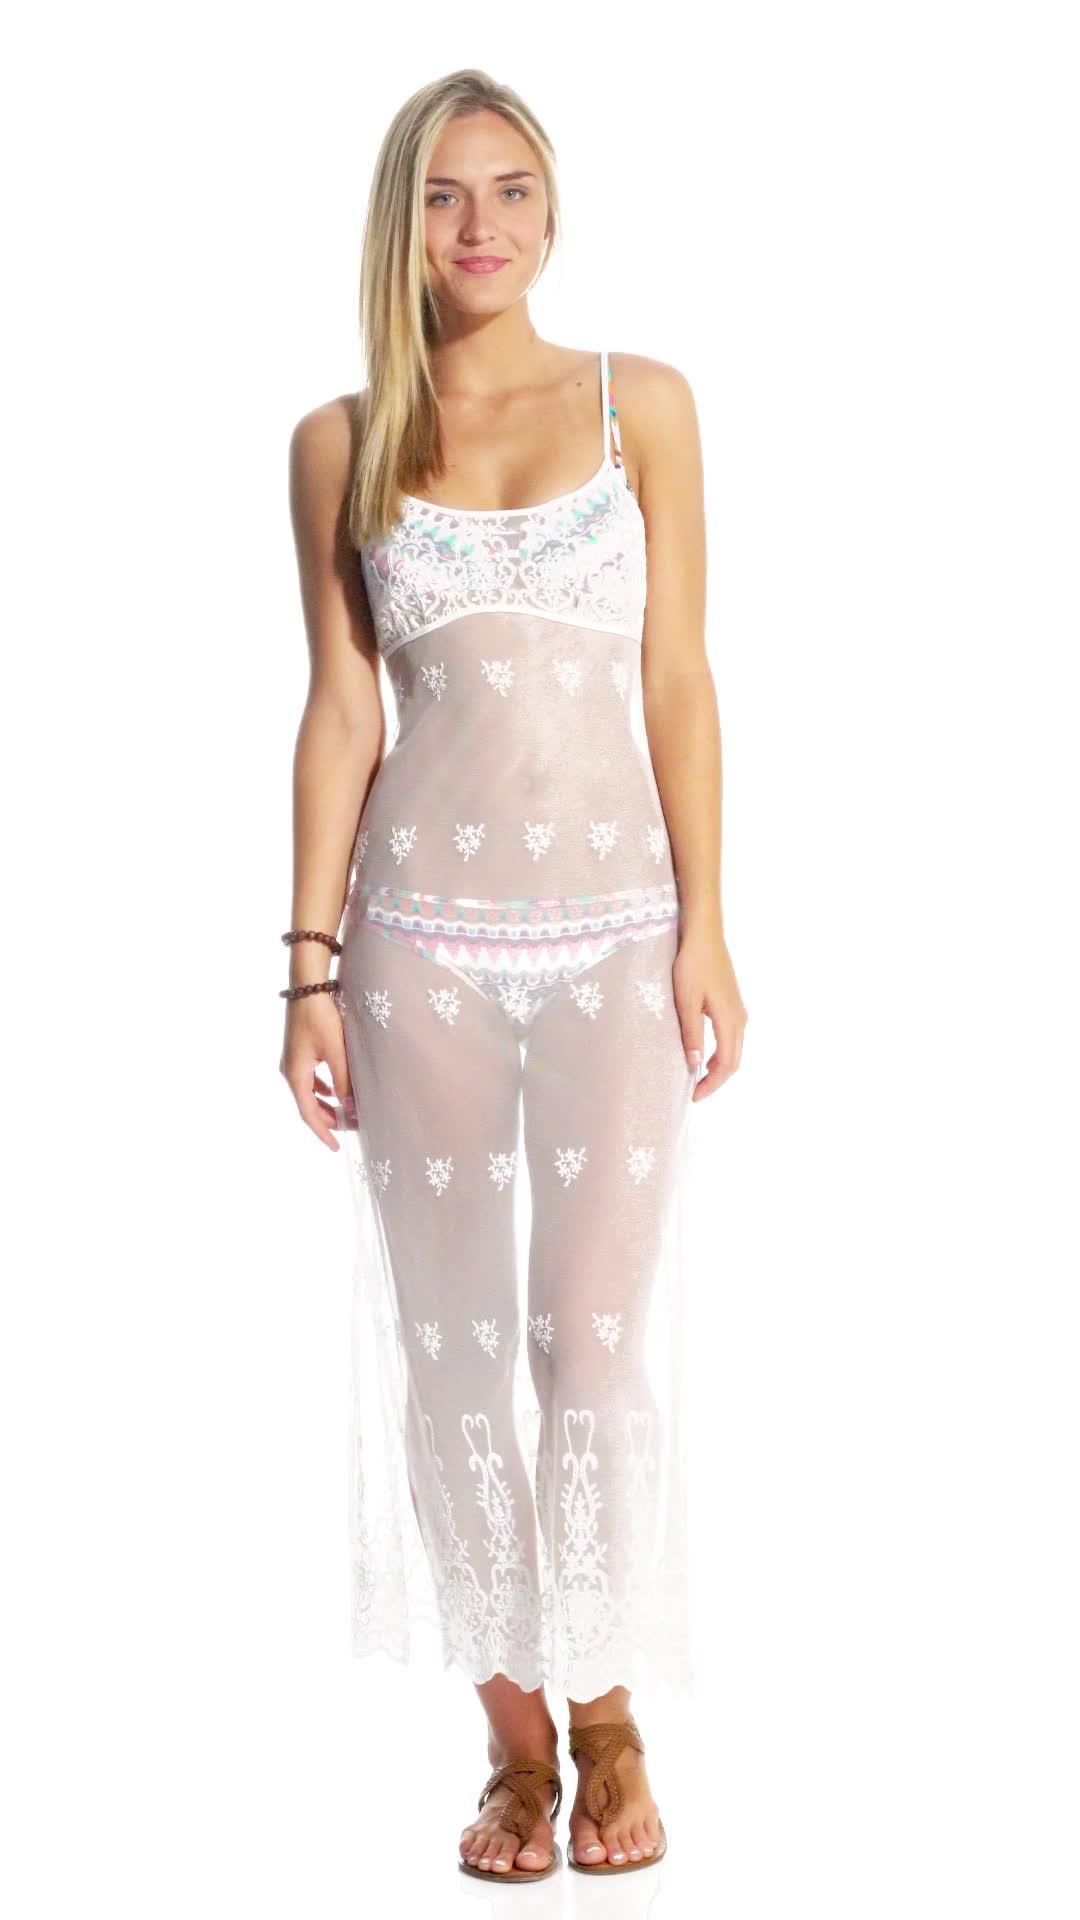 clairegerhardstein, Bikini Lab Shell Yeah Cover Up Dress GIFs